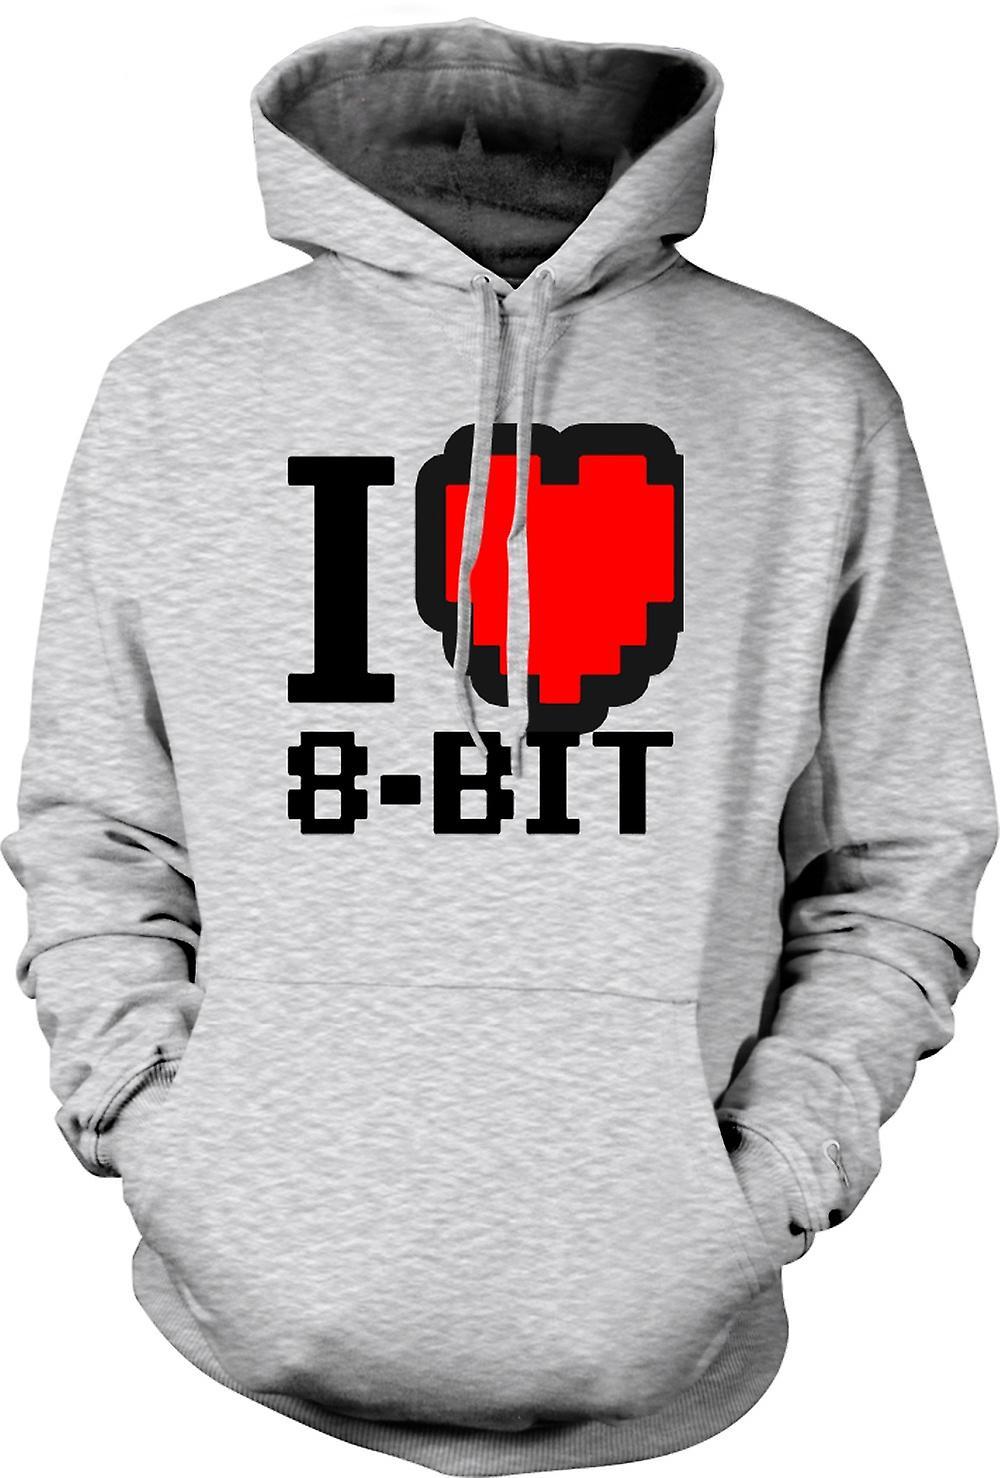 Mens Hoodie - I love 8 Bit - Retro - Computer